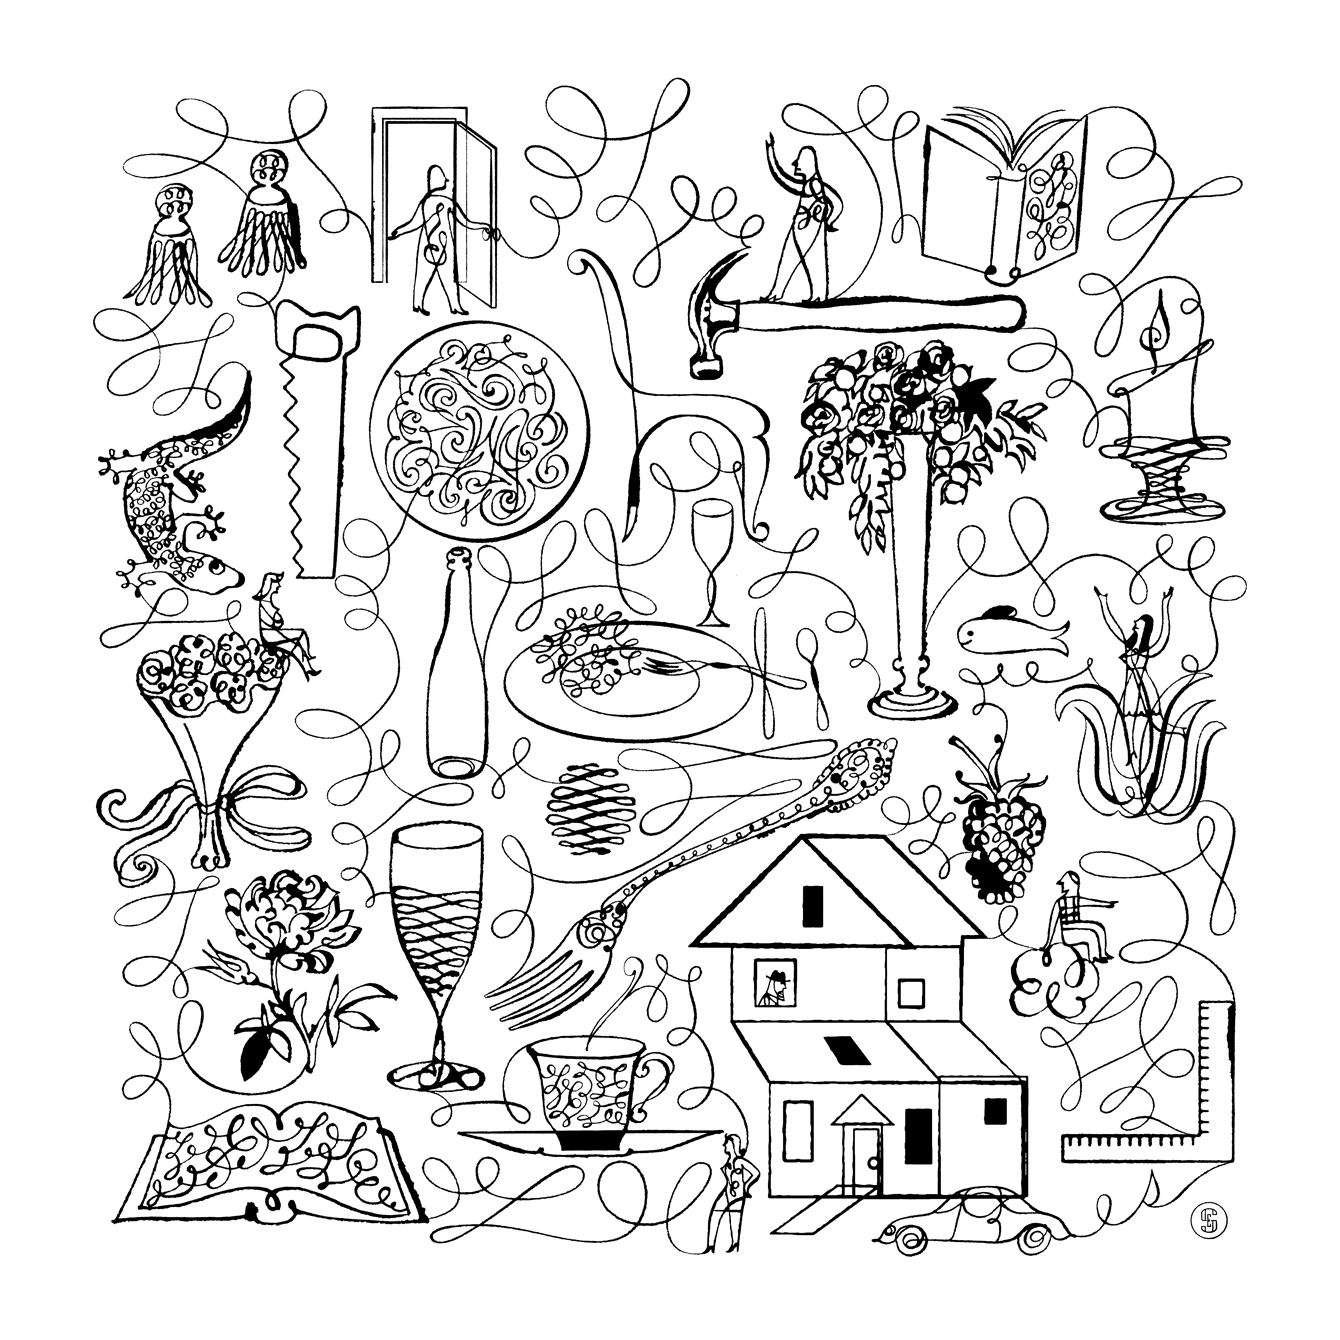 Home Again (Naturally) - Elvis Swift Dry Goods